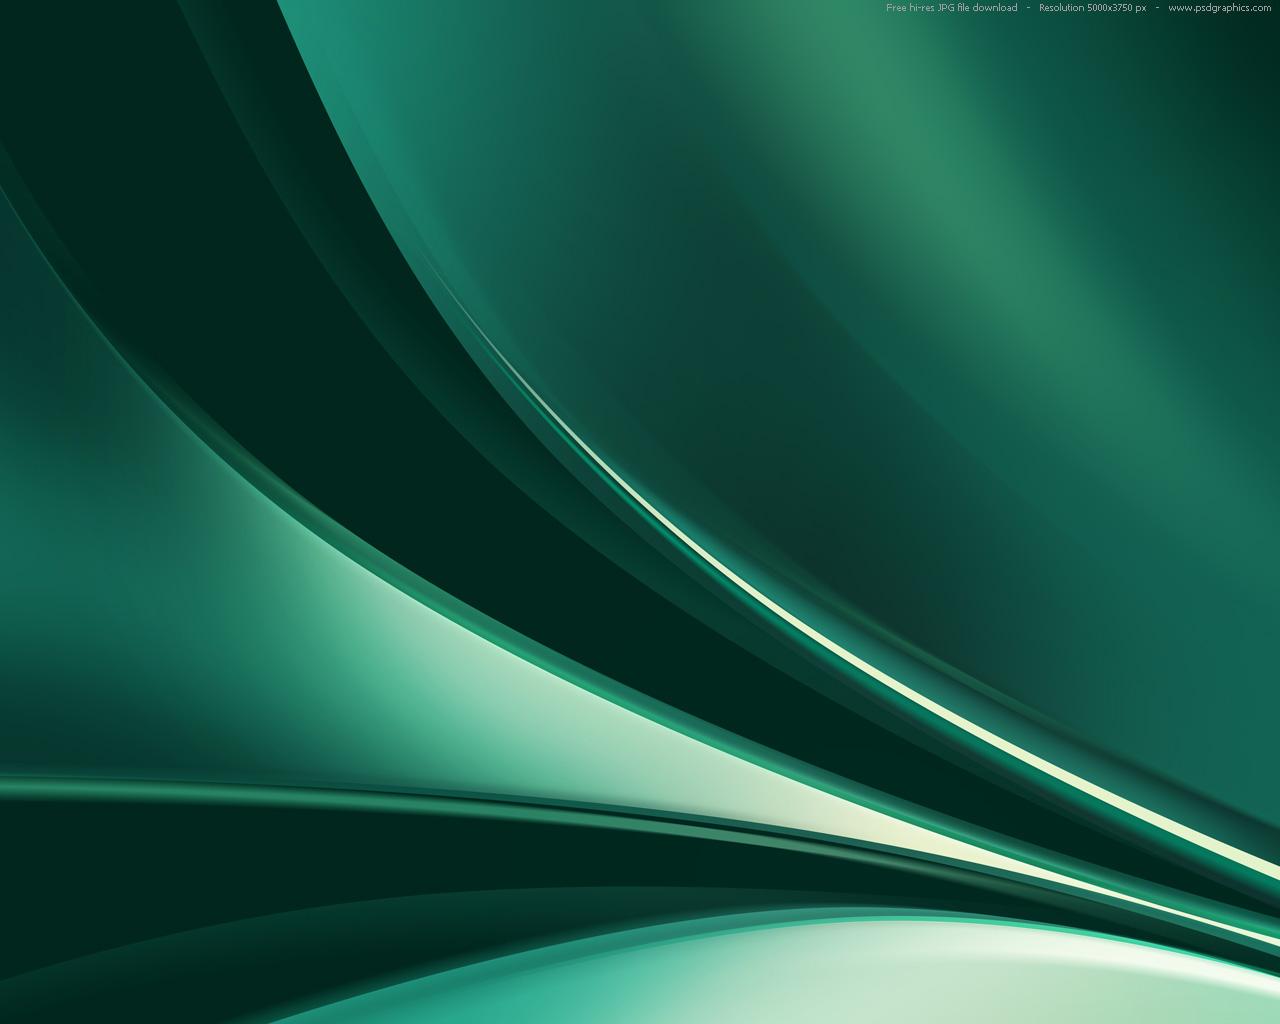 Dark Green Abstract Wallpaper Wallpapers History 1280x1024